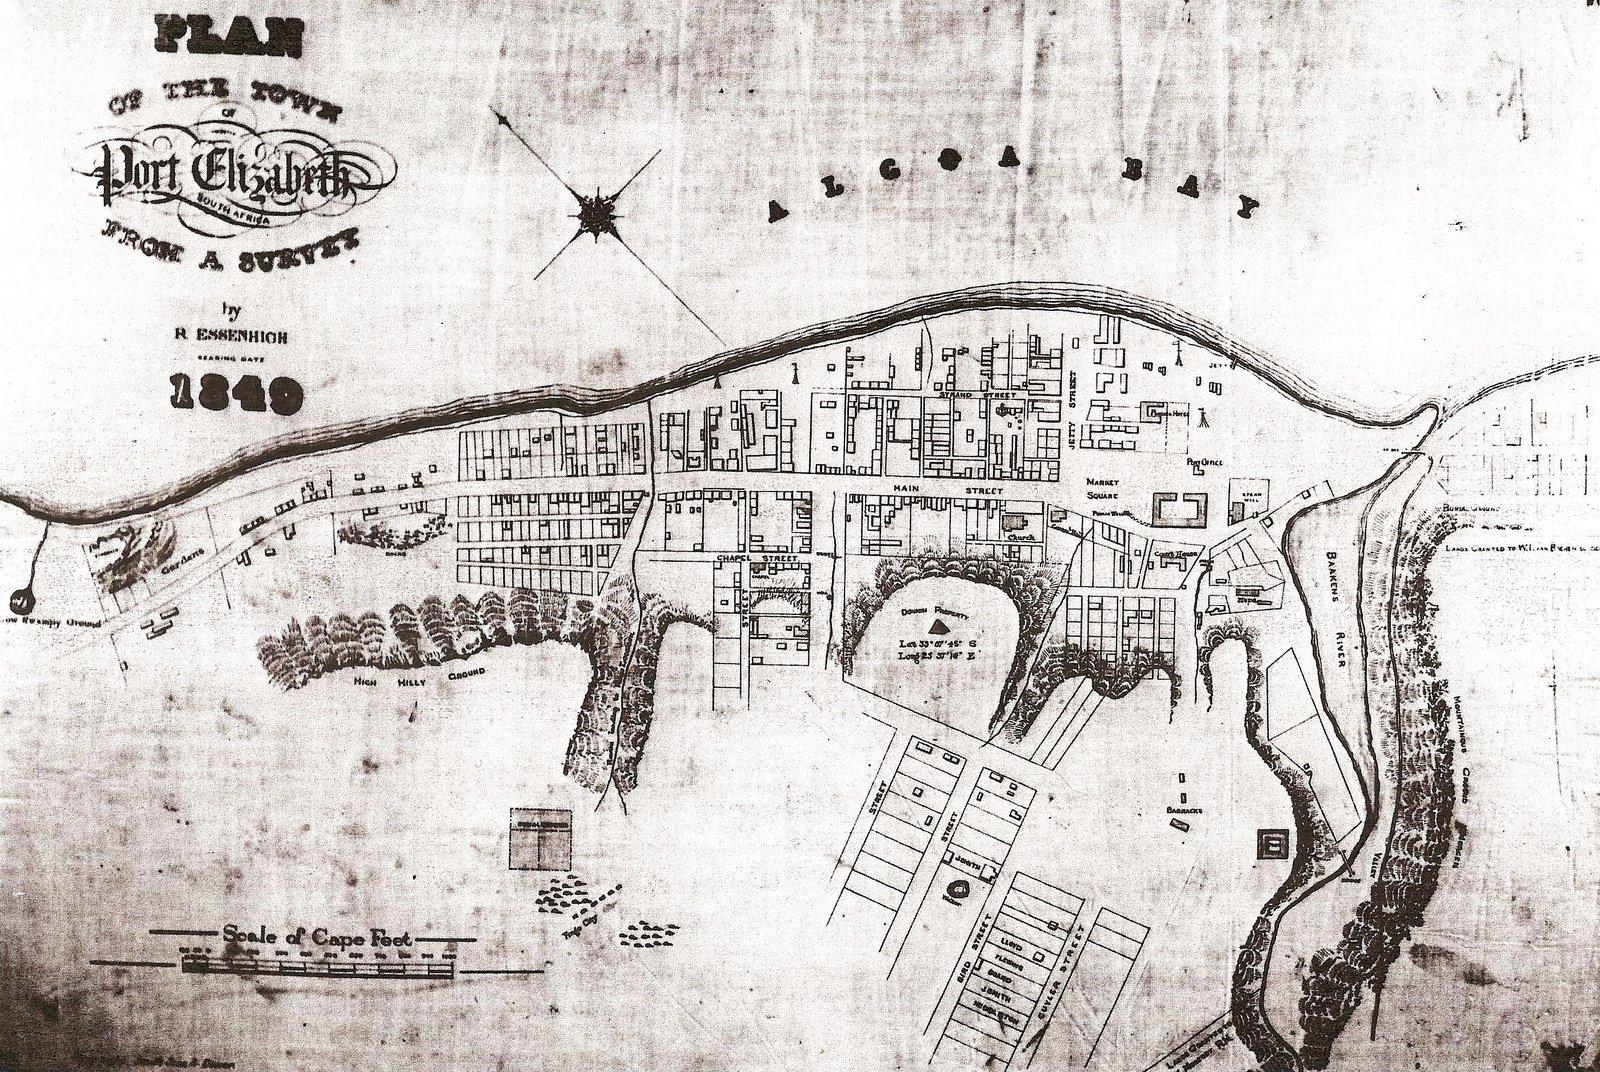 Map of Port Elizabeth in 1849